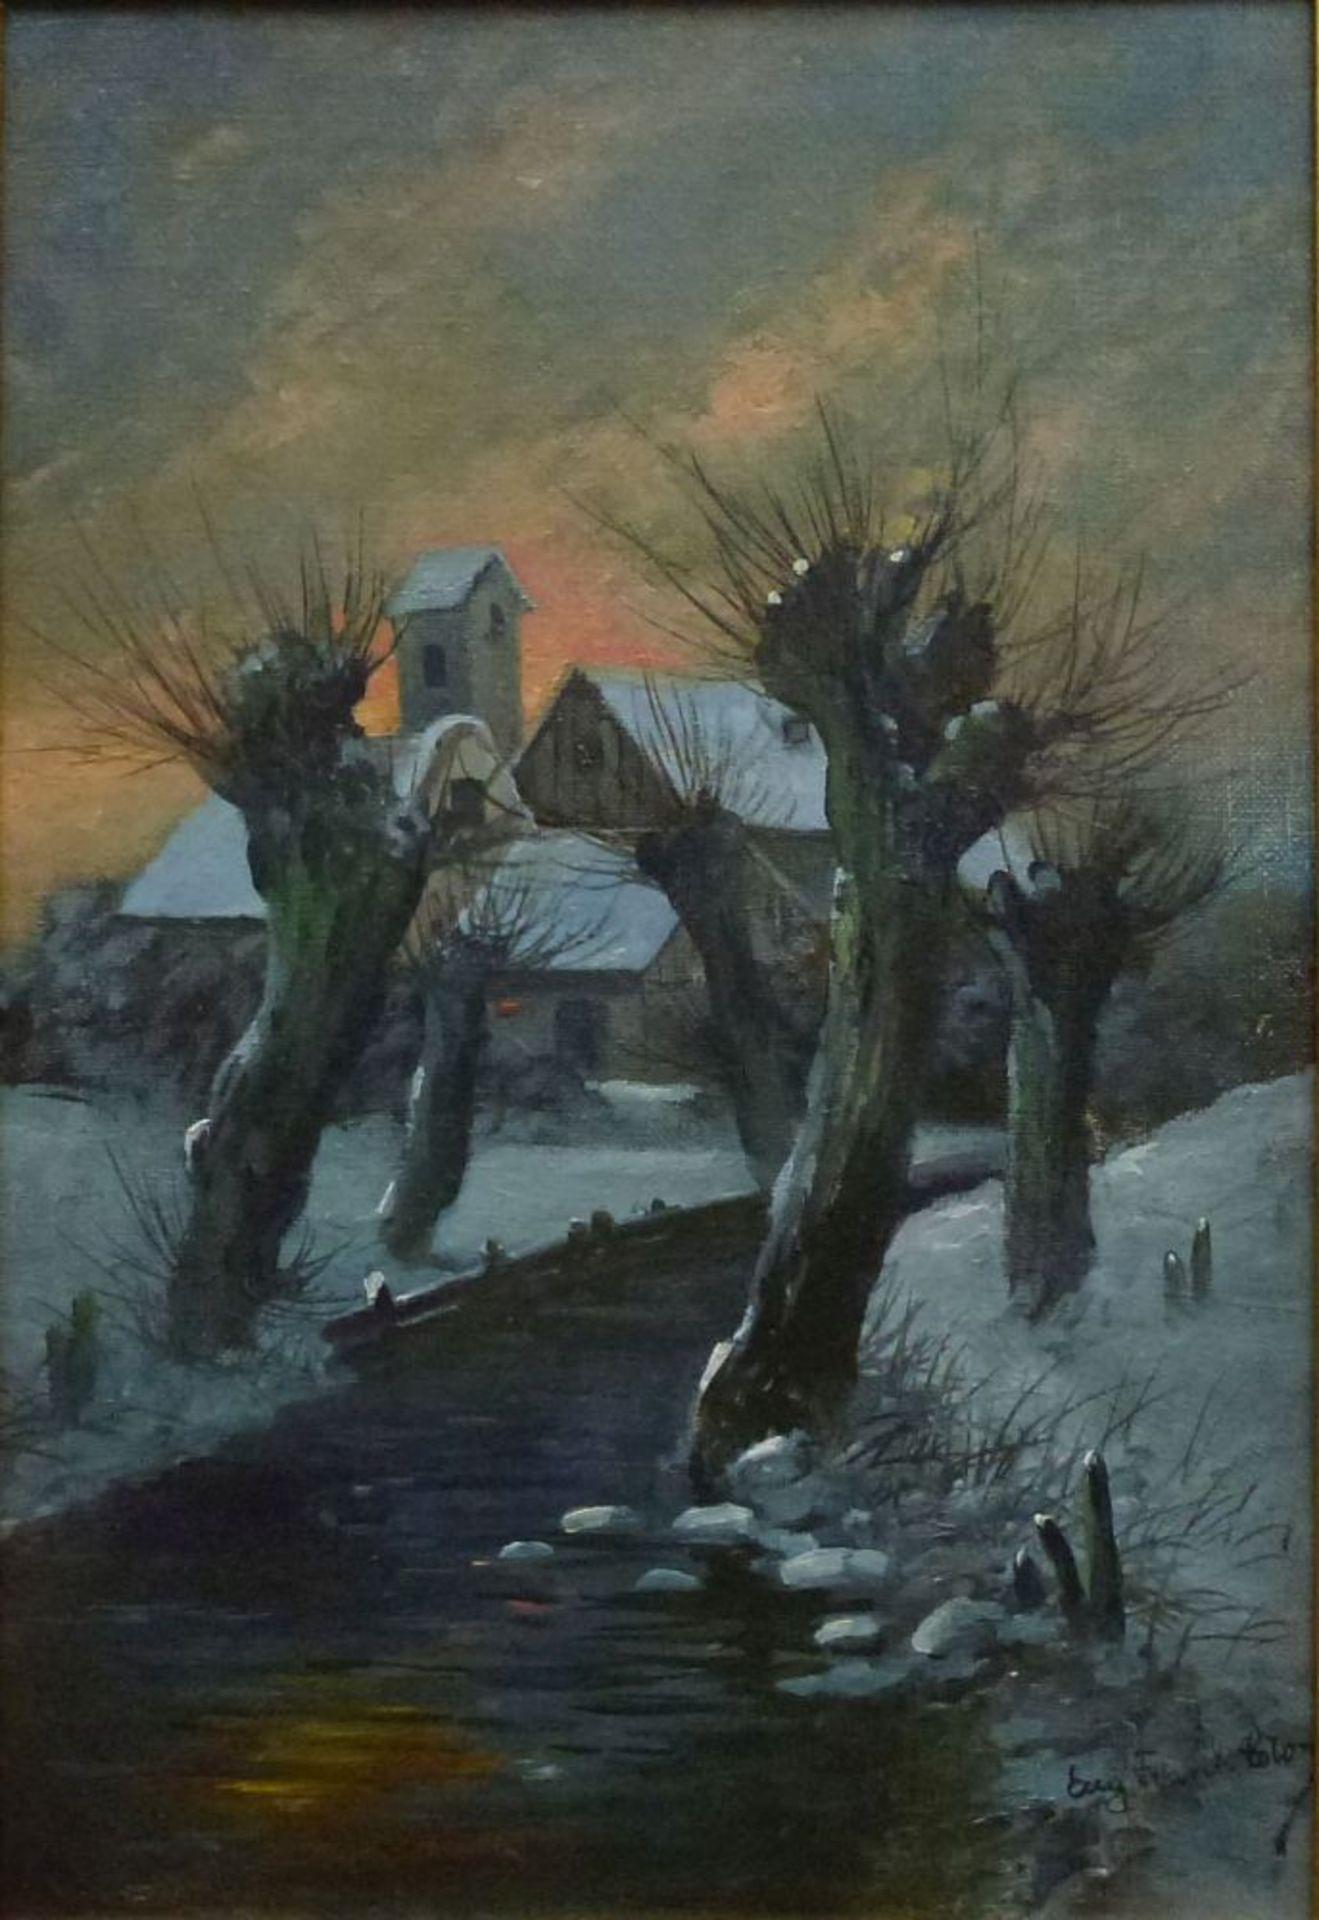 Winter, Eugen Frank-ColonÖl/Lw, sign., Weg zw. Kopfweiden, Hof im HG, R, 36x26cm